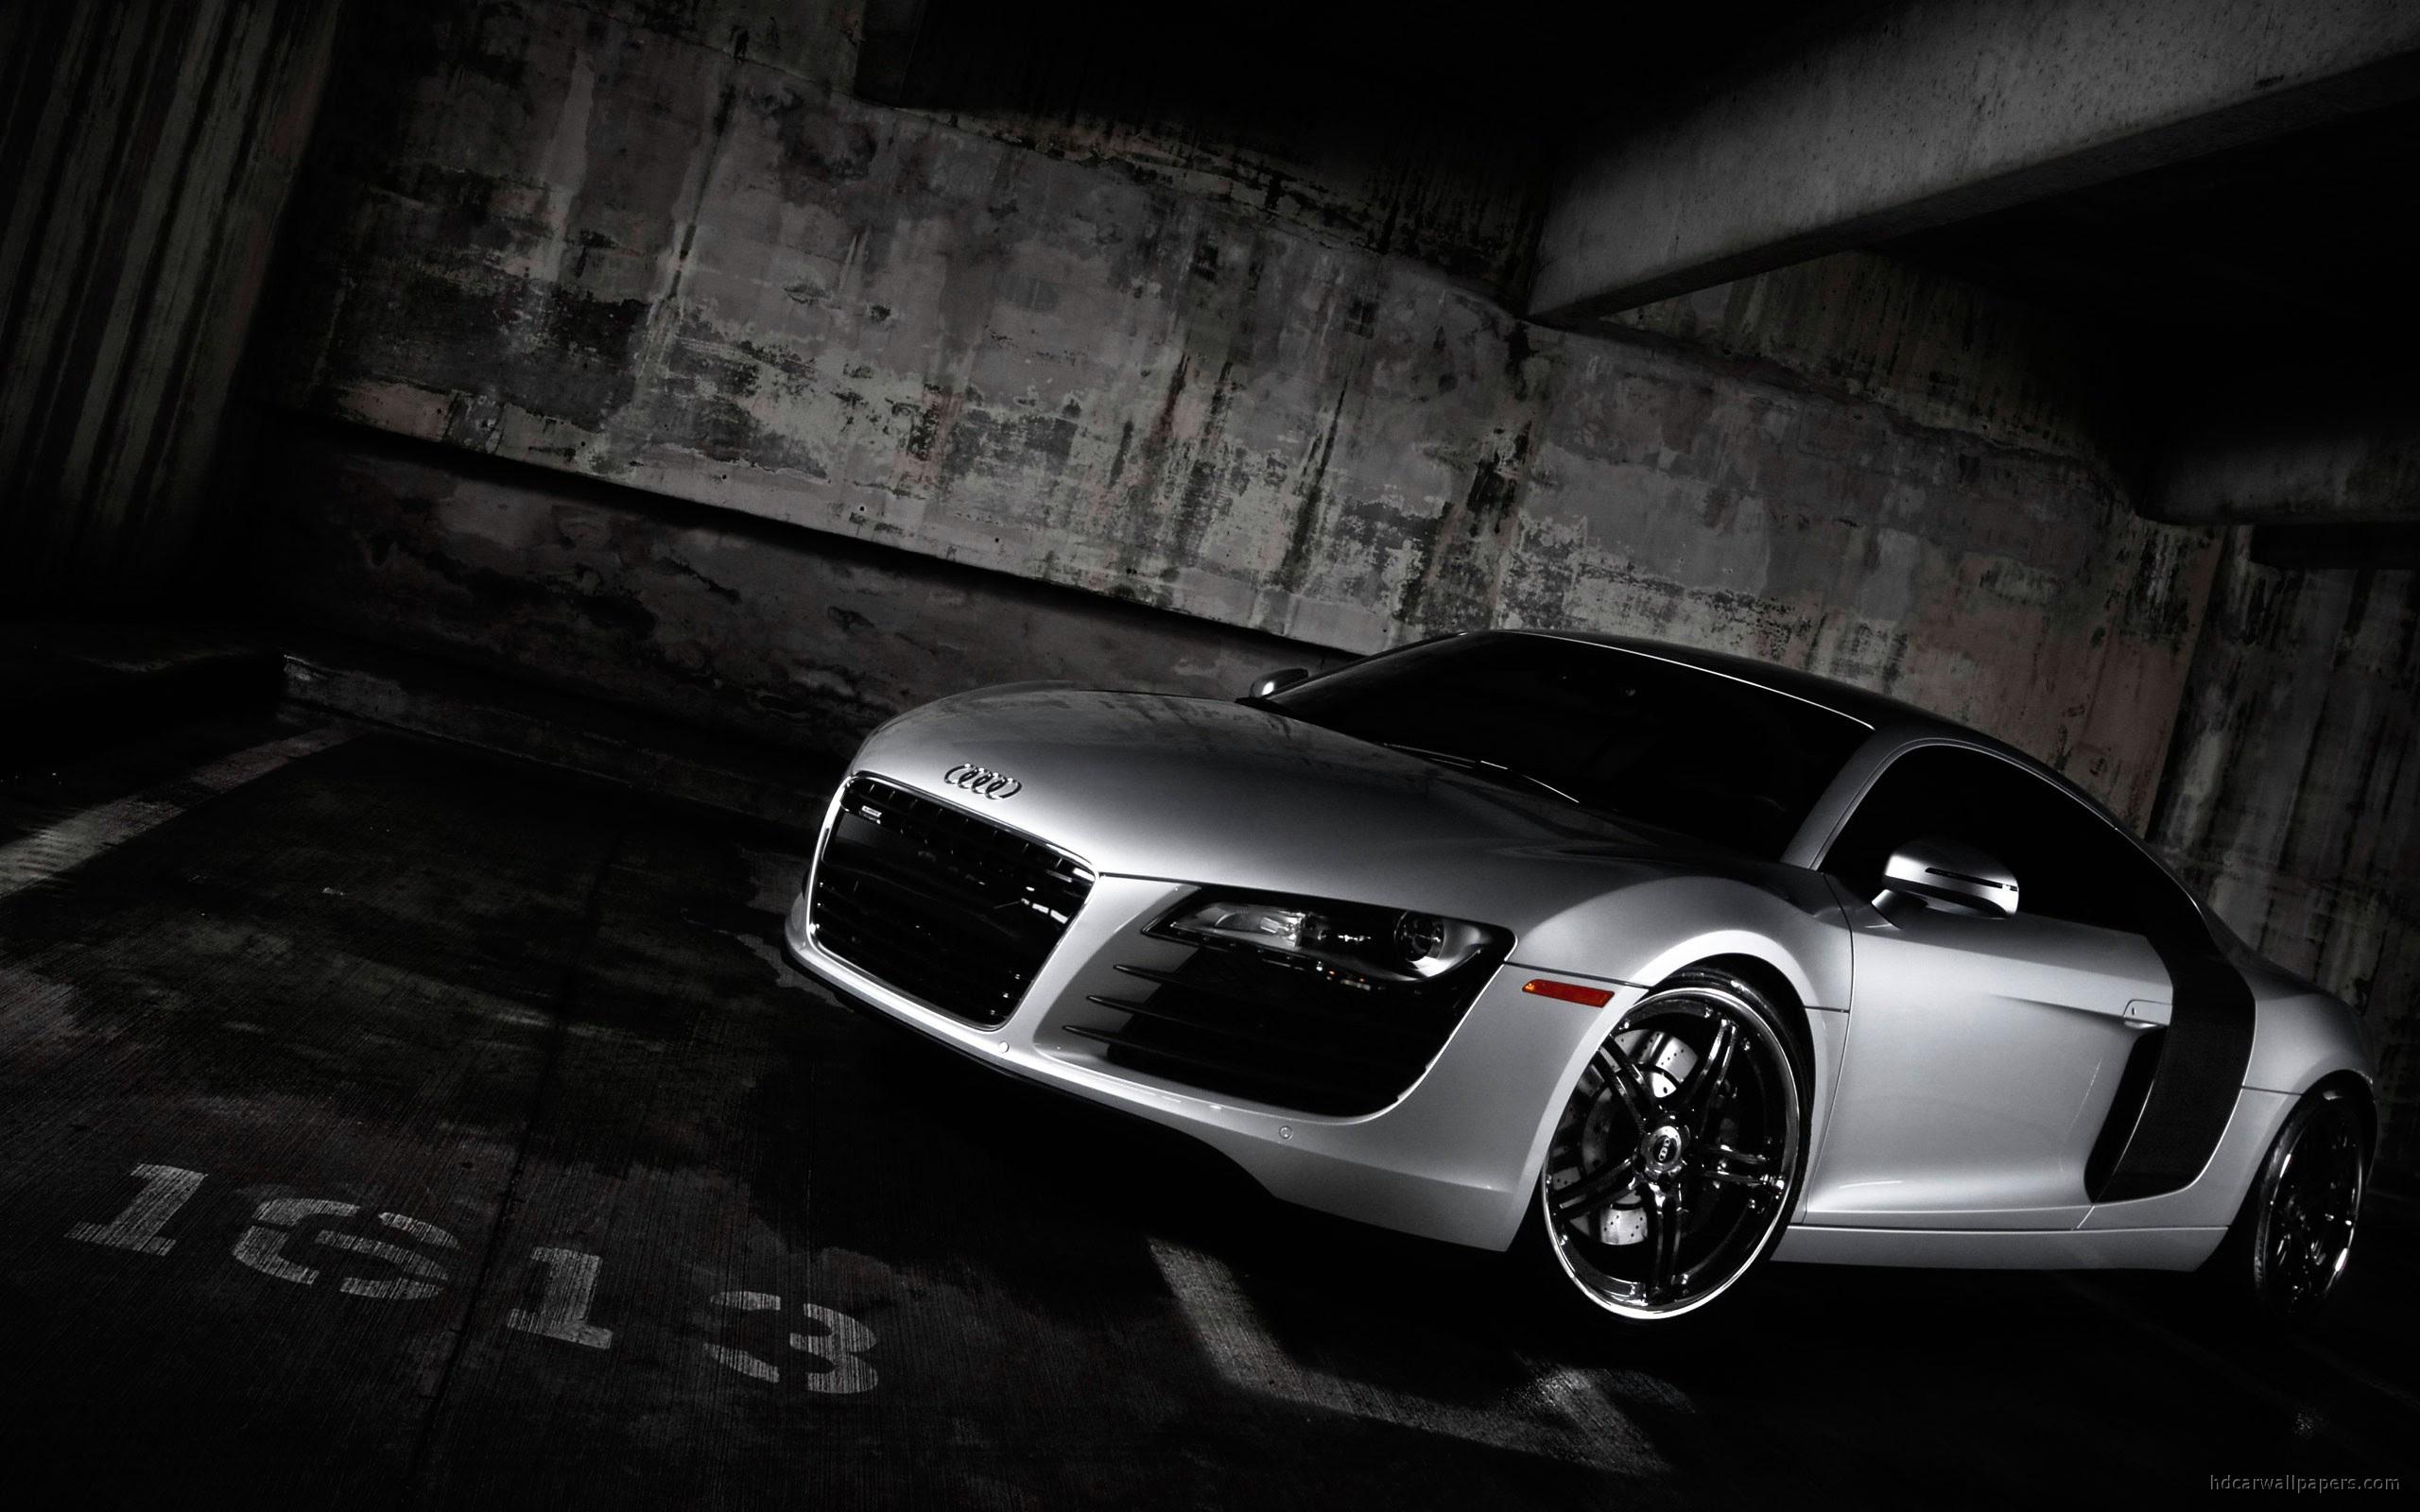 Audi R8 HD Widescree